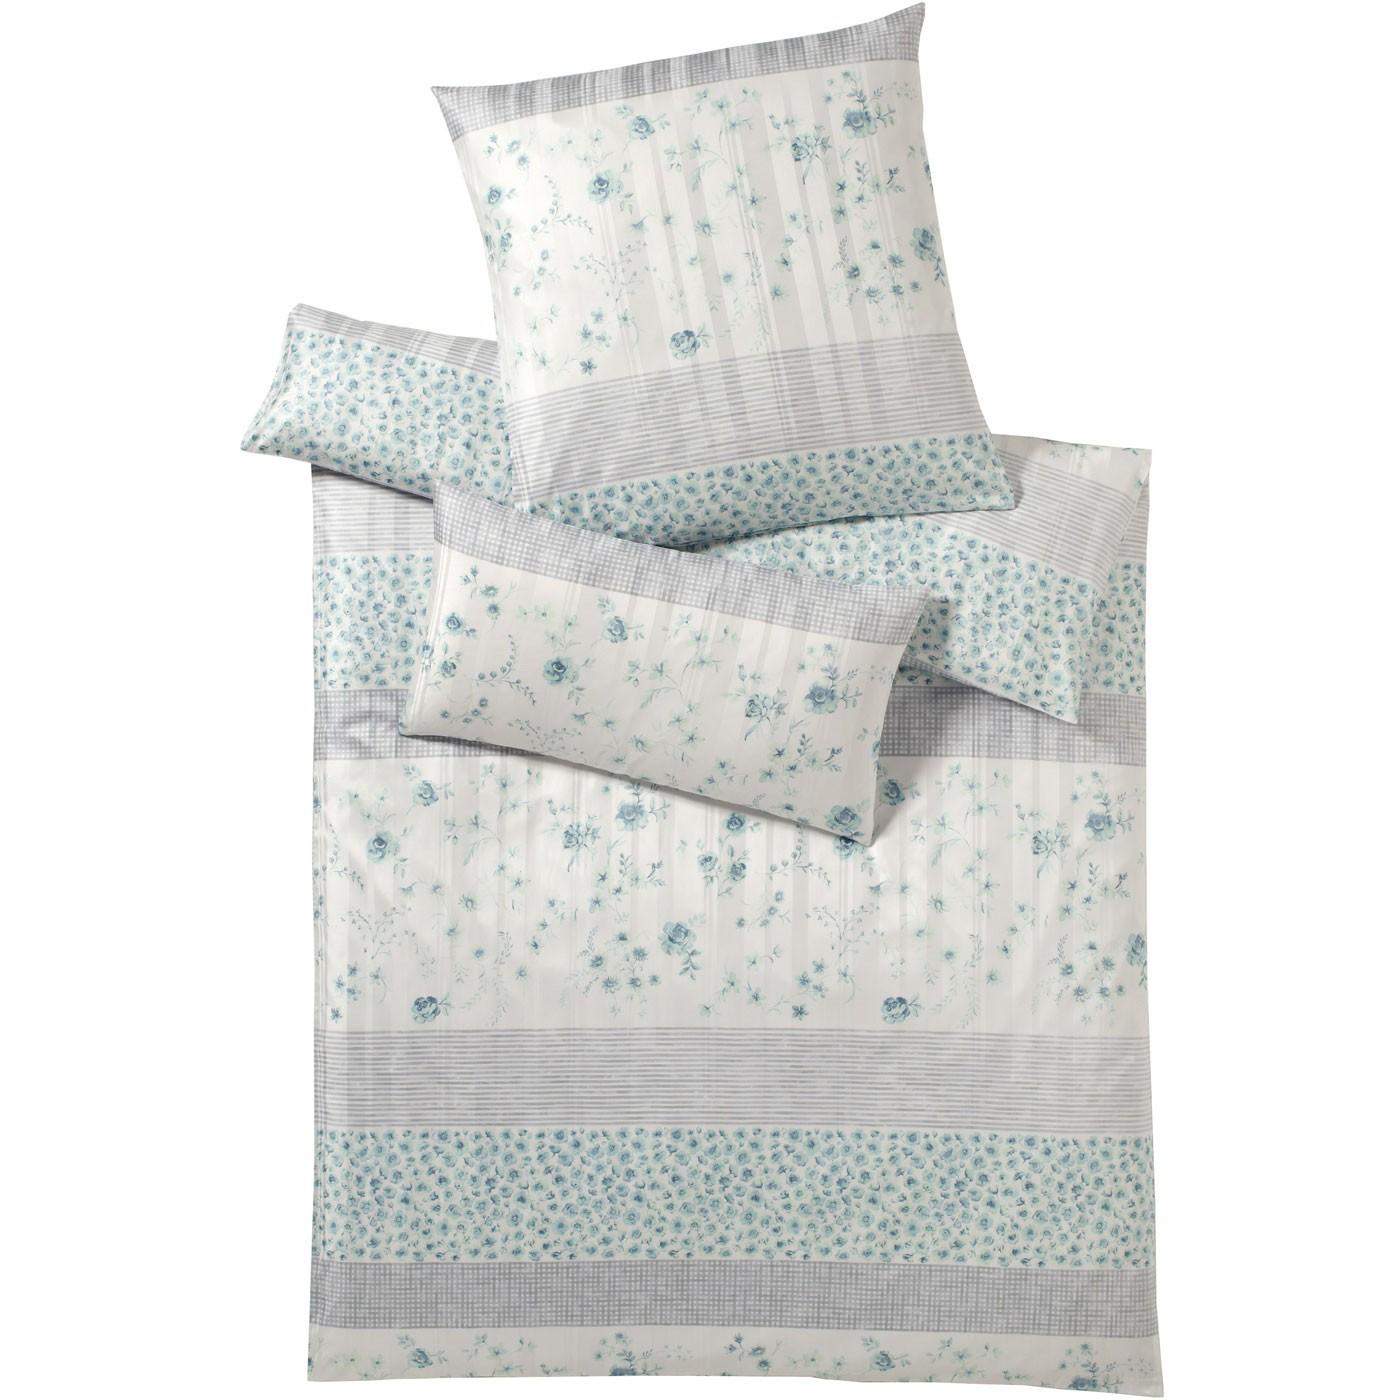 Для сна Наволочка 35x40 Elegante Cornwall синяя elitnaya-navolochka-cornwall-sinyaya-ot-elegante-germaniya.jpg